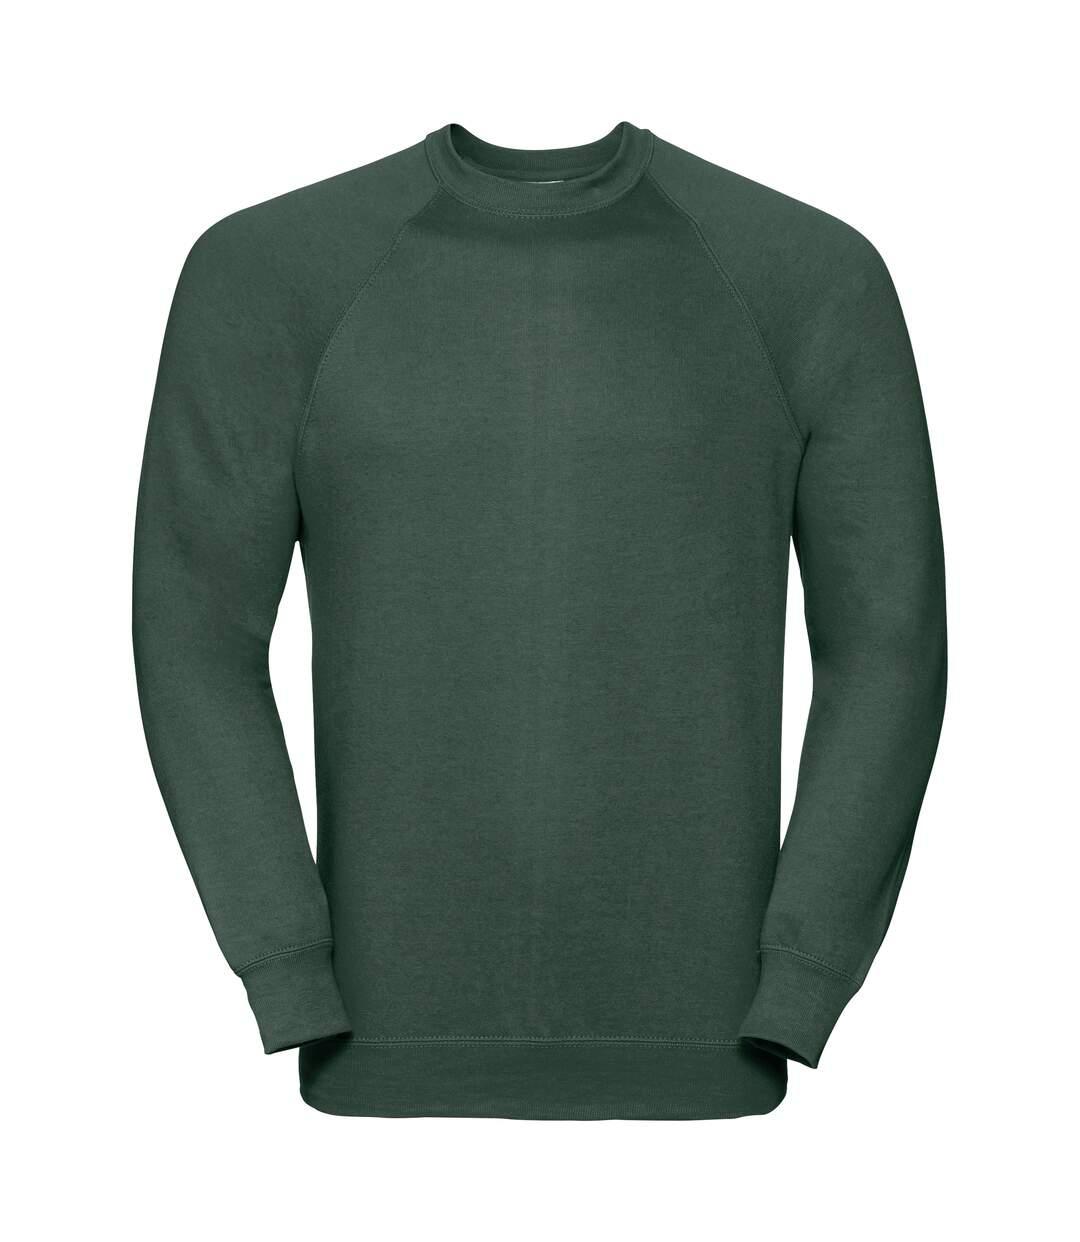 Russell Classic Sweatshirt (Bottle Green) - UTBC573